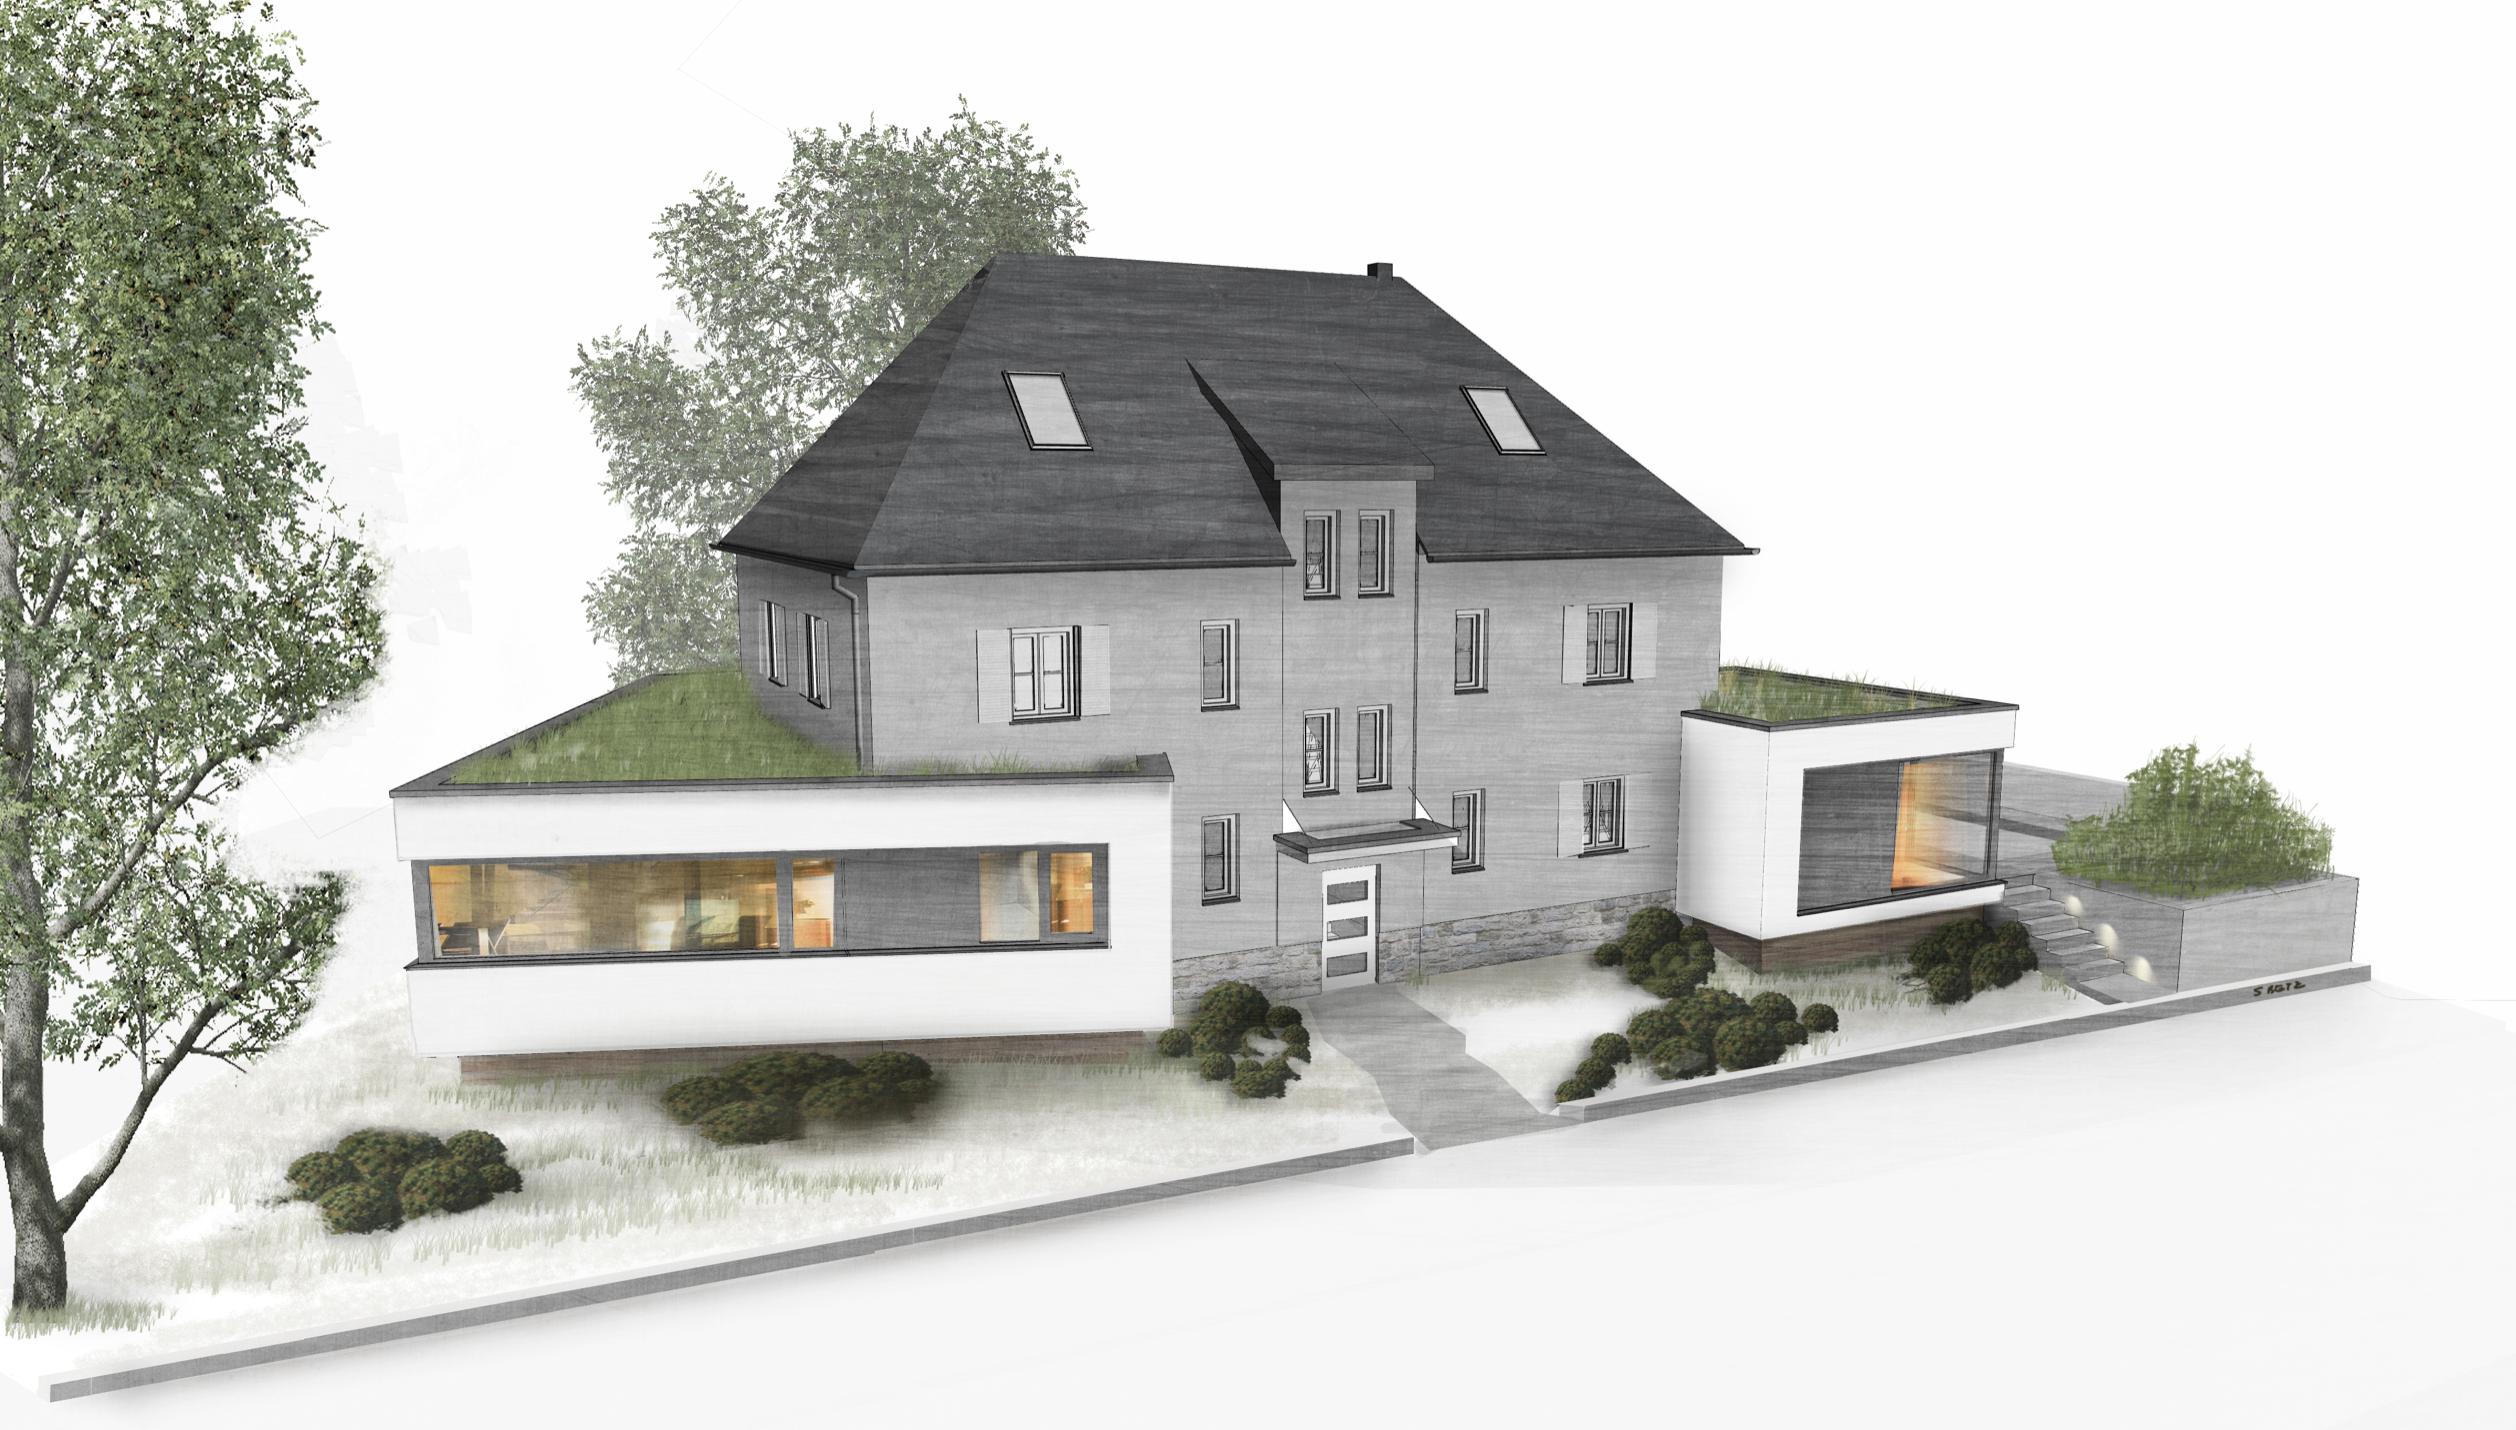 Entwurf wohnhaus leipzig koloriert innenarchitektur for Innenarchitektur leipzig